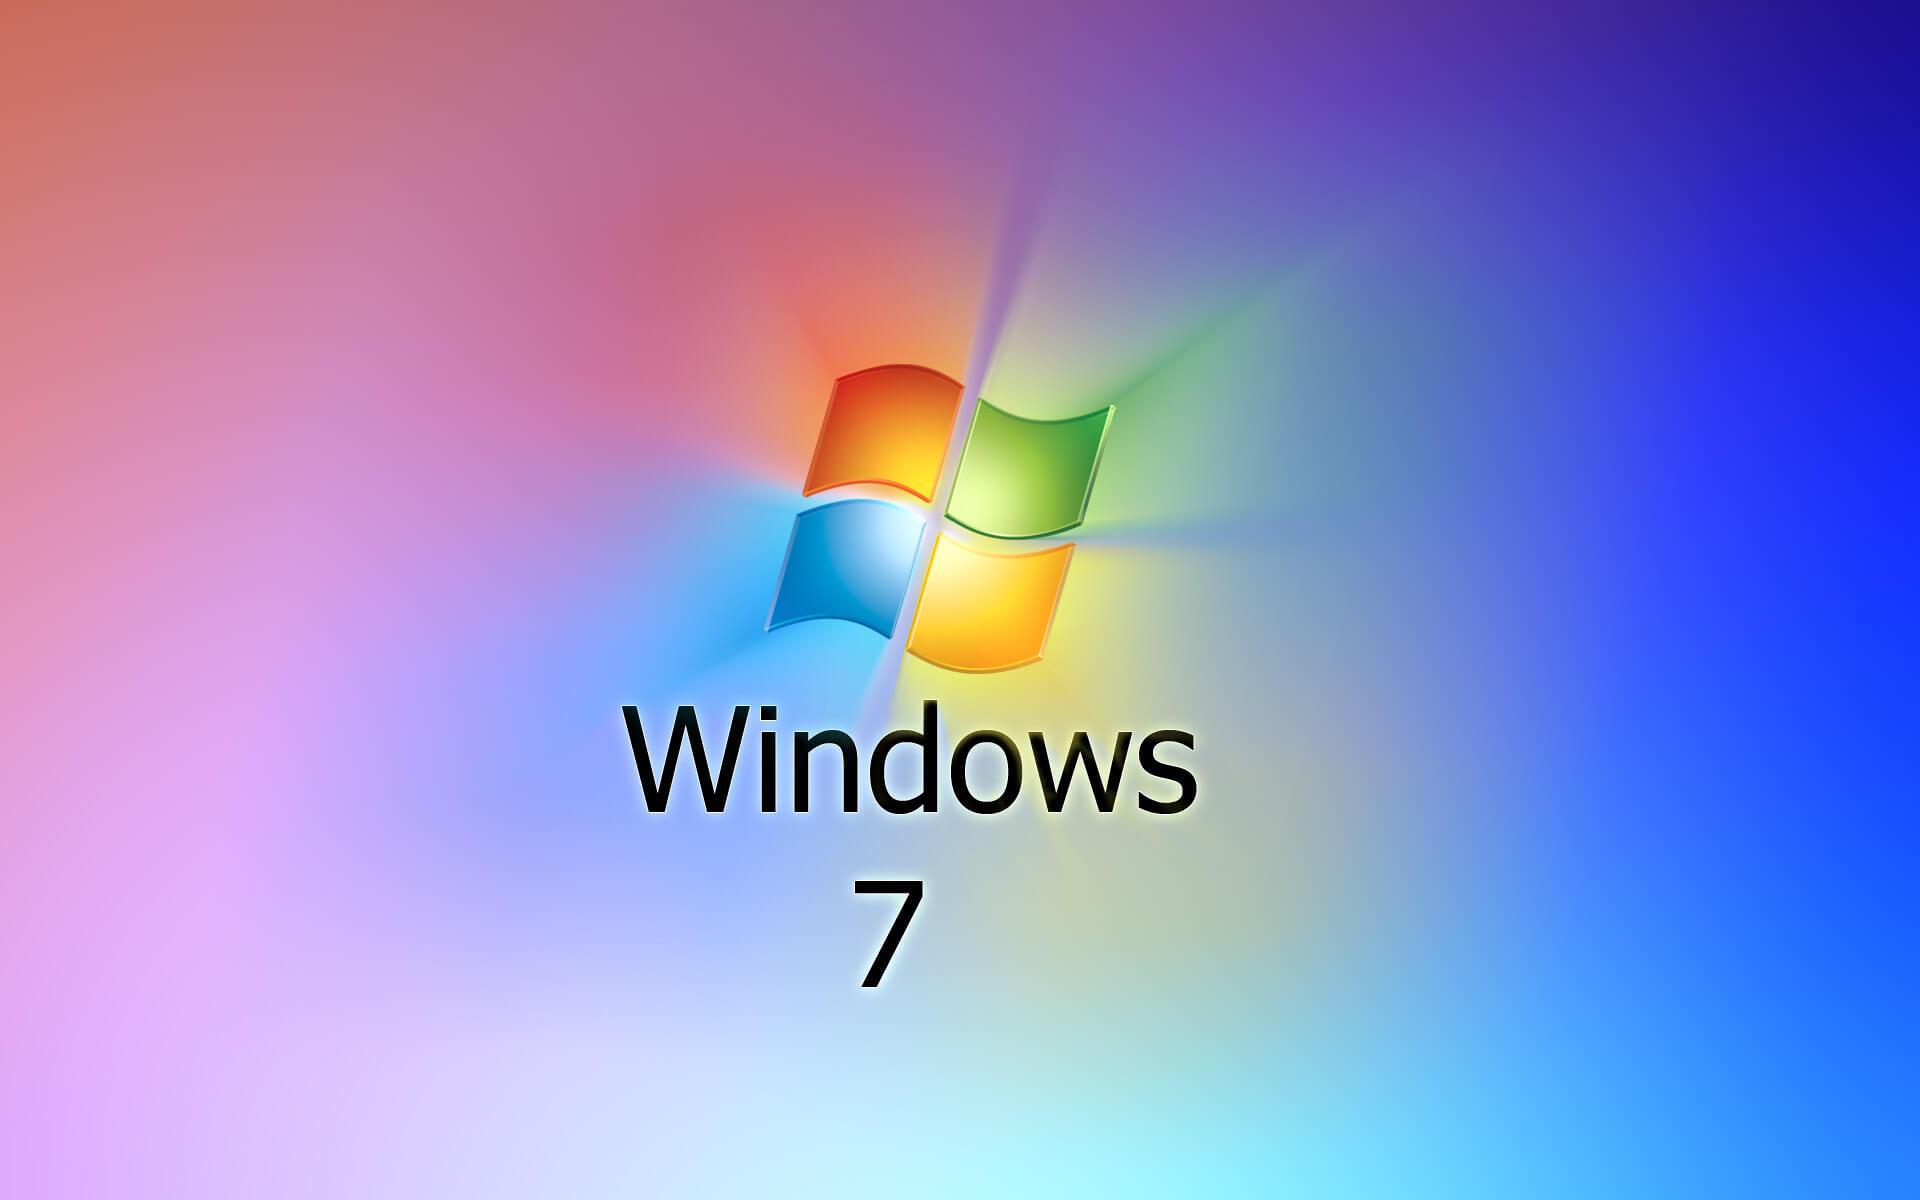 Windows 7 Product Key Generator 32 bit free download